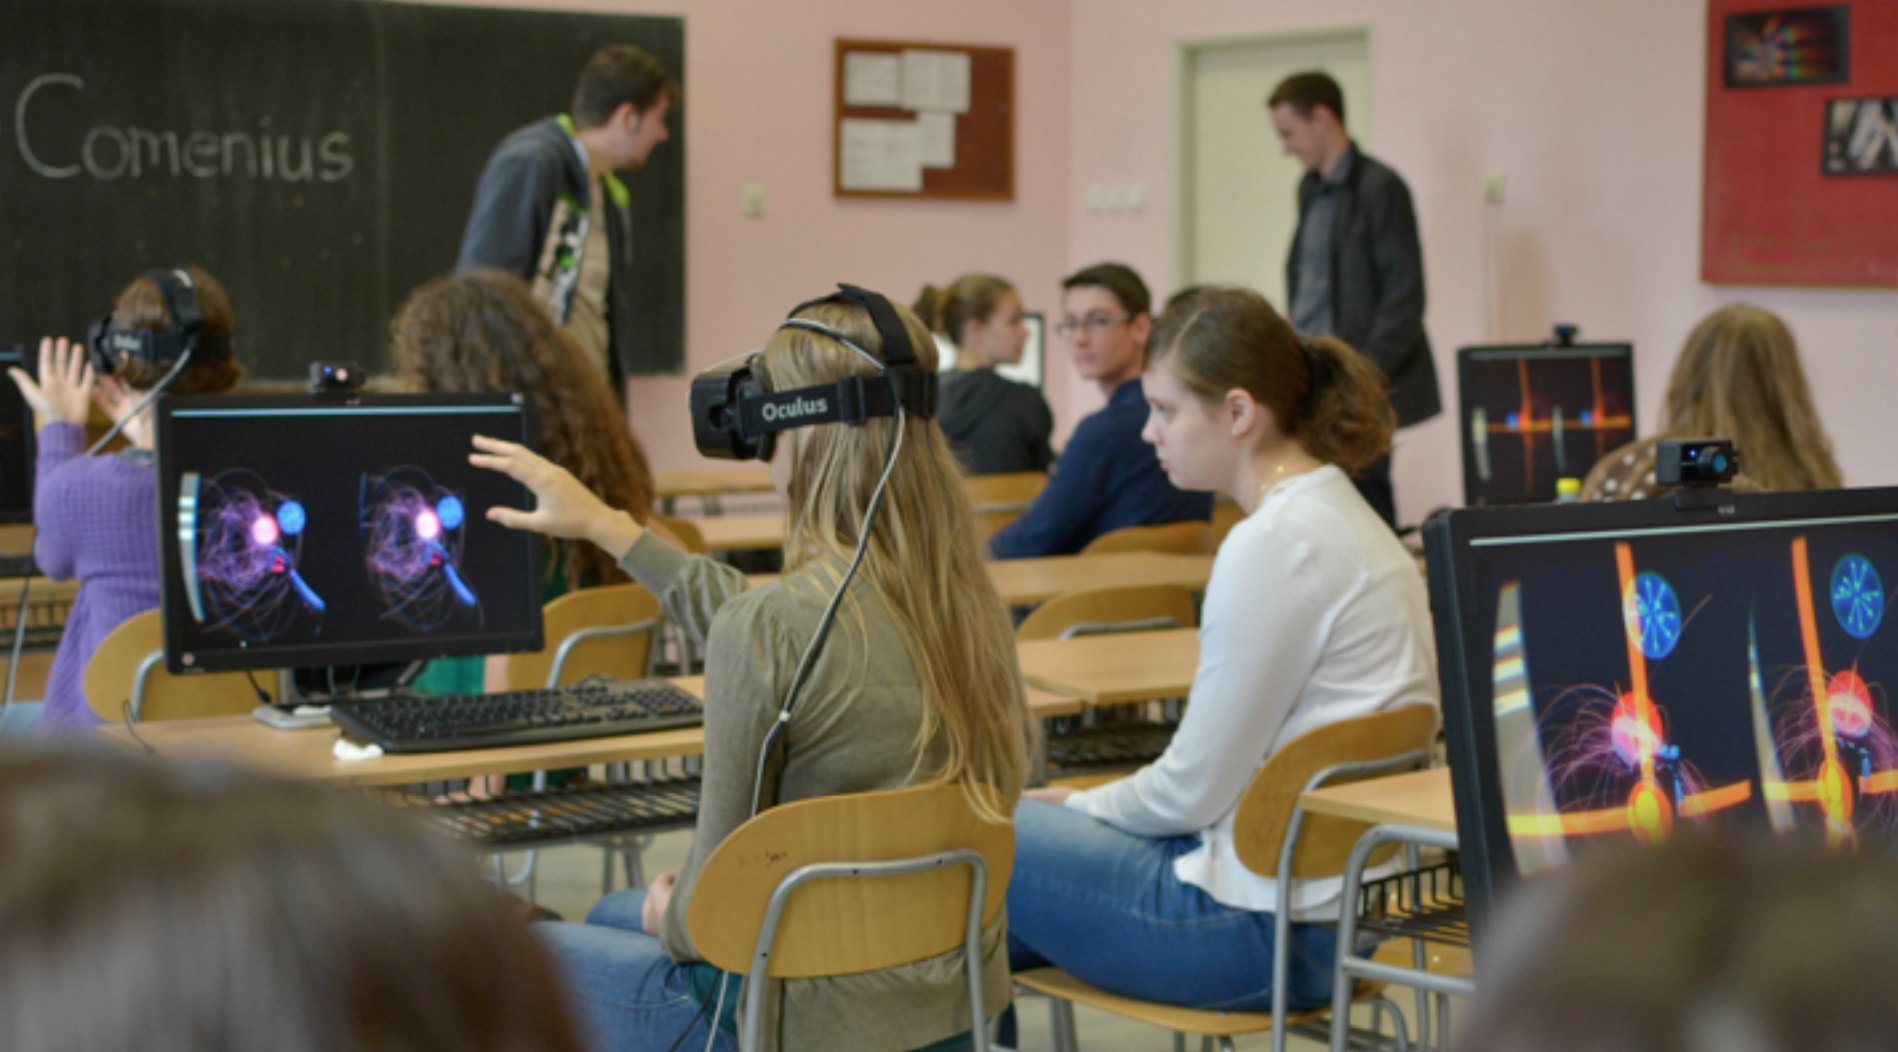 Bron: http://www.roadtovr.com/world-of-comenius-virtual-reality-education-biology-lesson-leap-motion-oculus-rift-dk2/